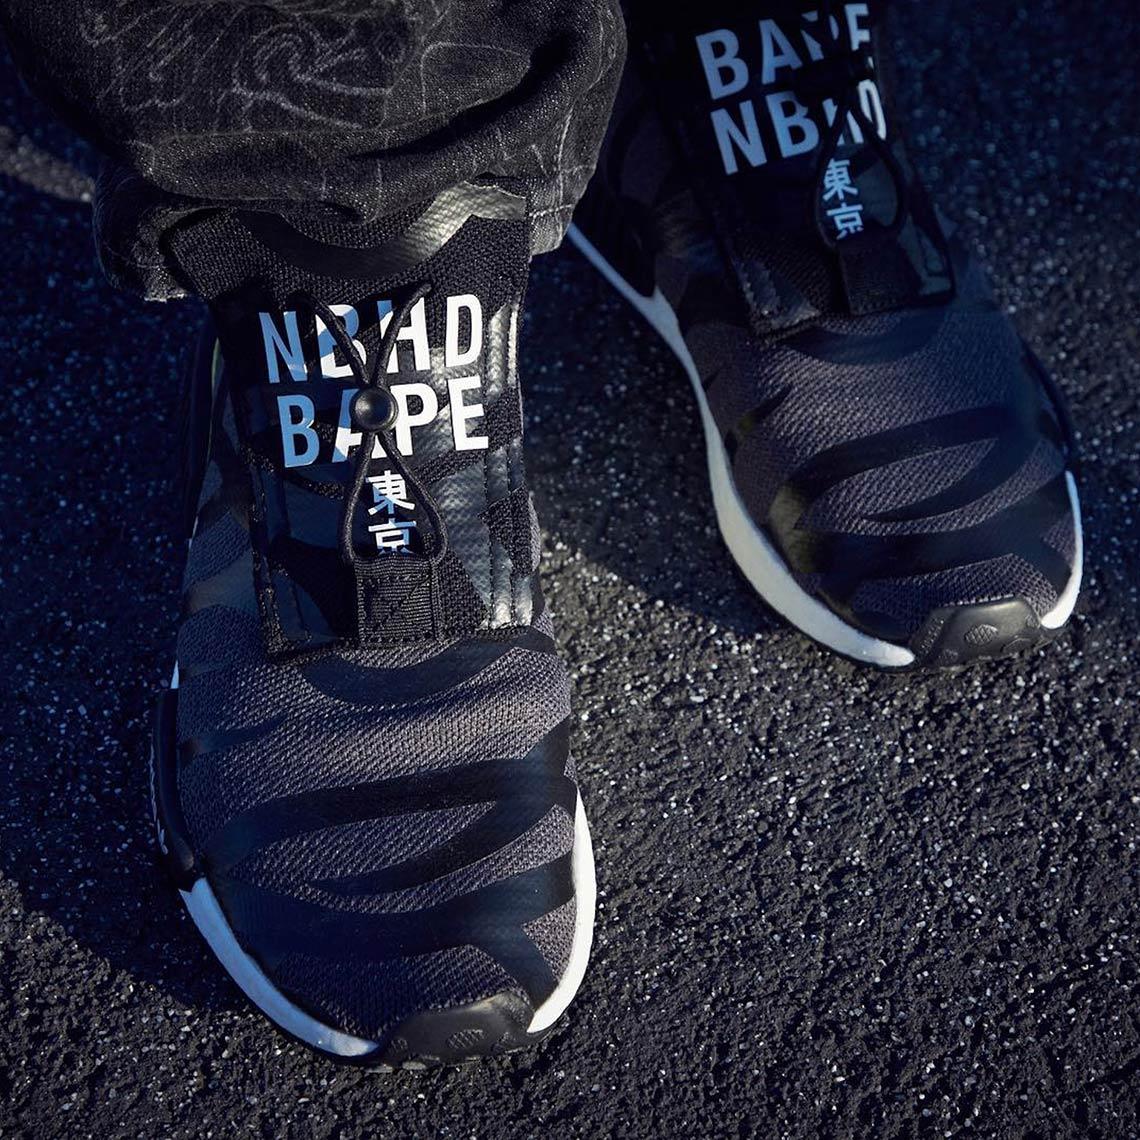 Bape Neighborhood Adidas NMD TS1 POD S31